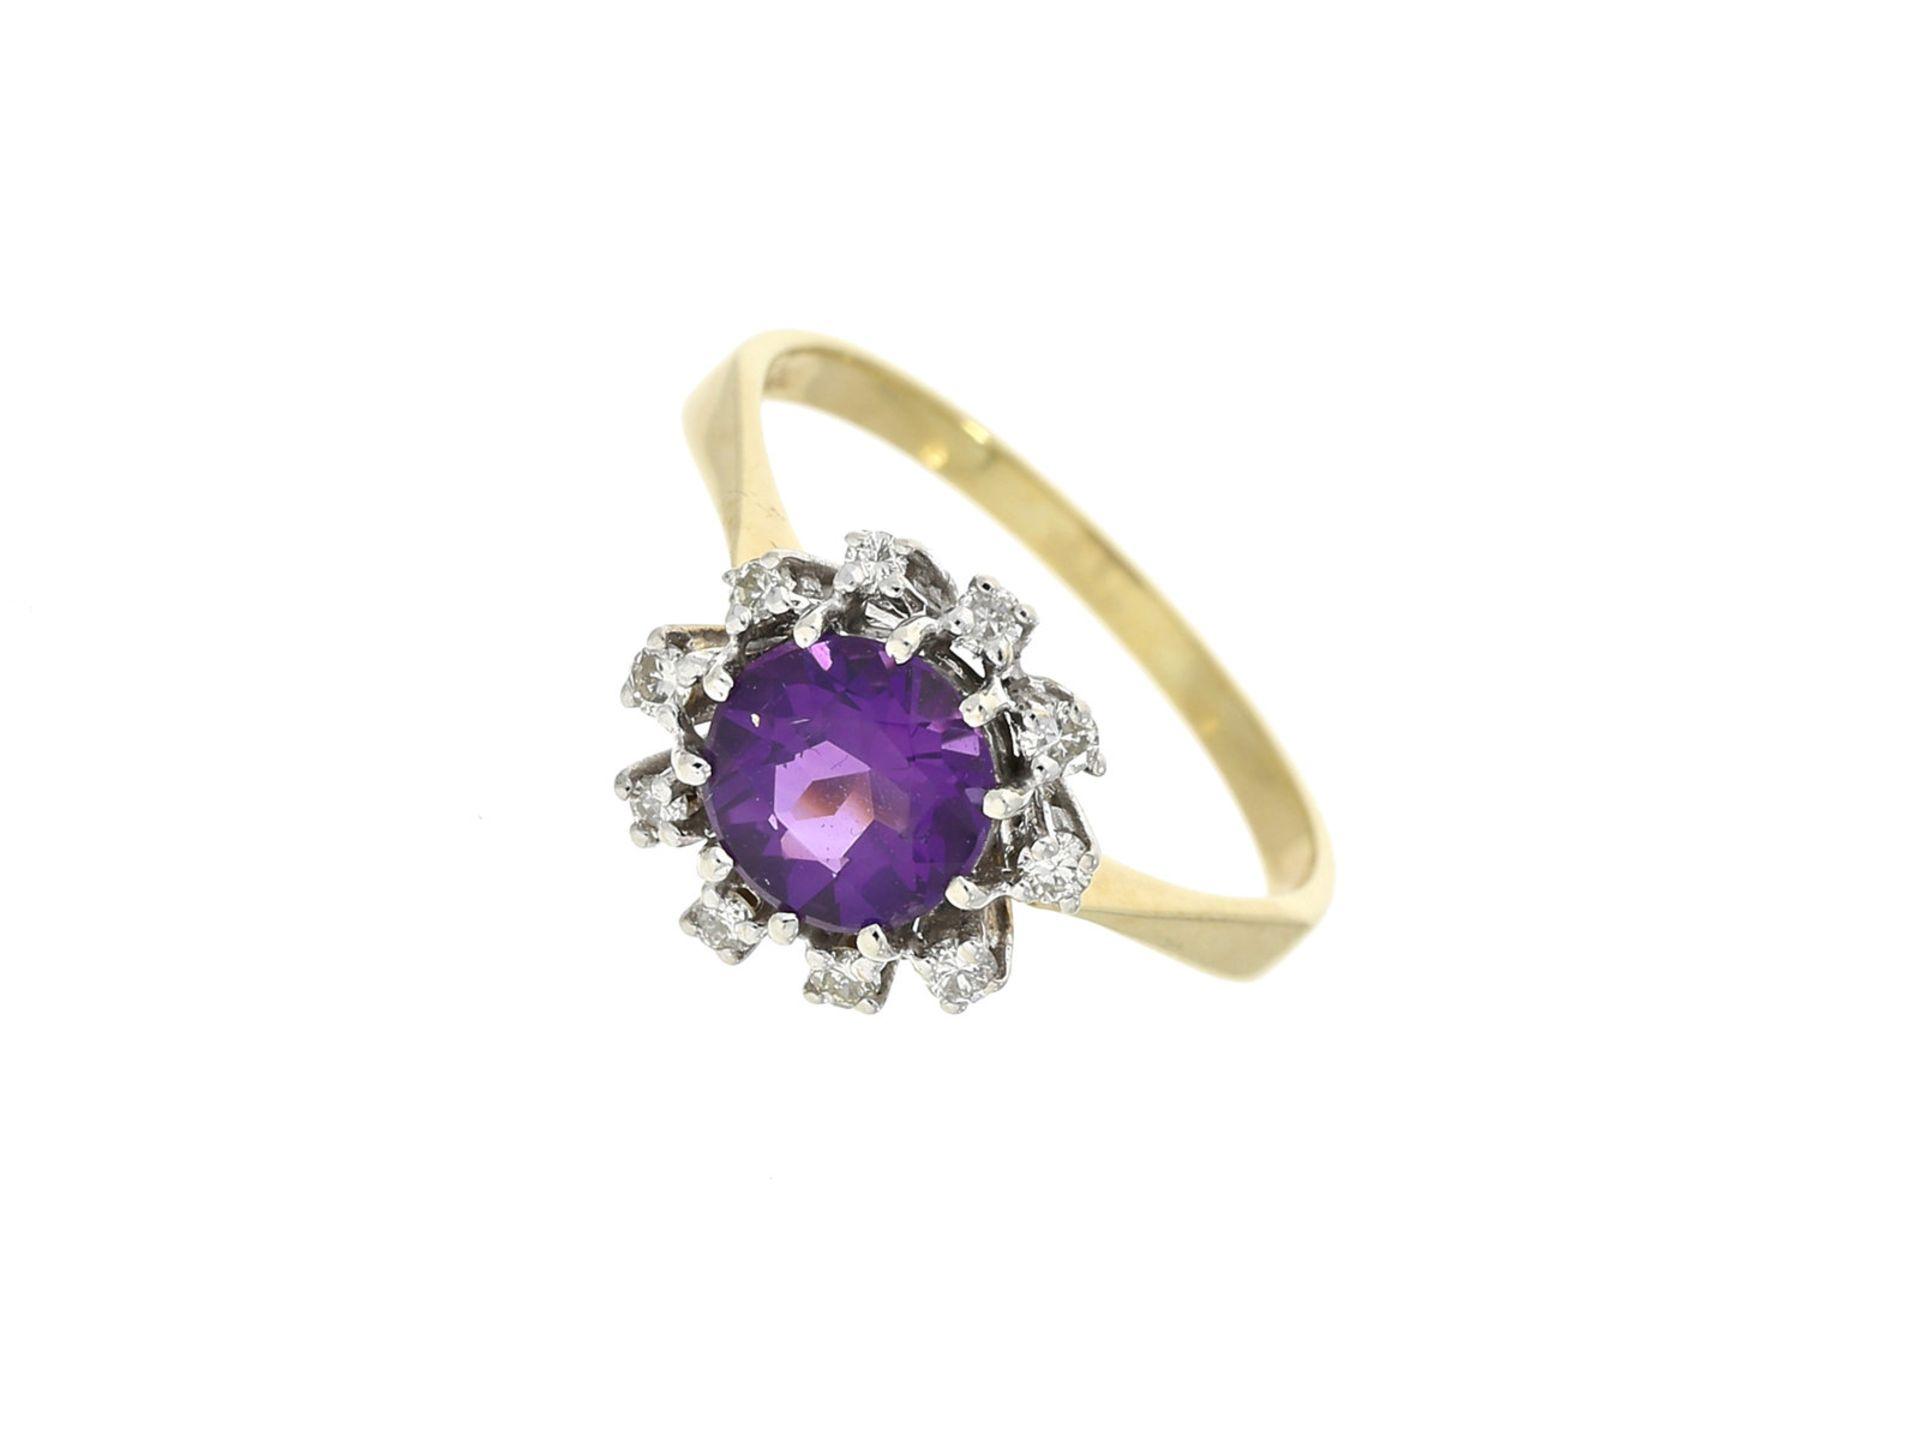 Ring: klassischer vintage Amethyst/Brillant-GoldschmiederingCa. Ø18mm, RG57, ca. 3,6g, 14K Gold,